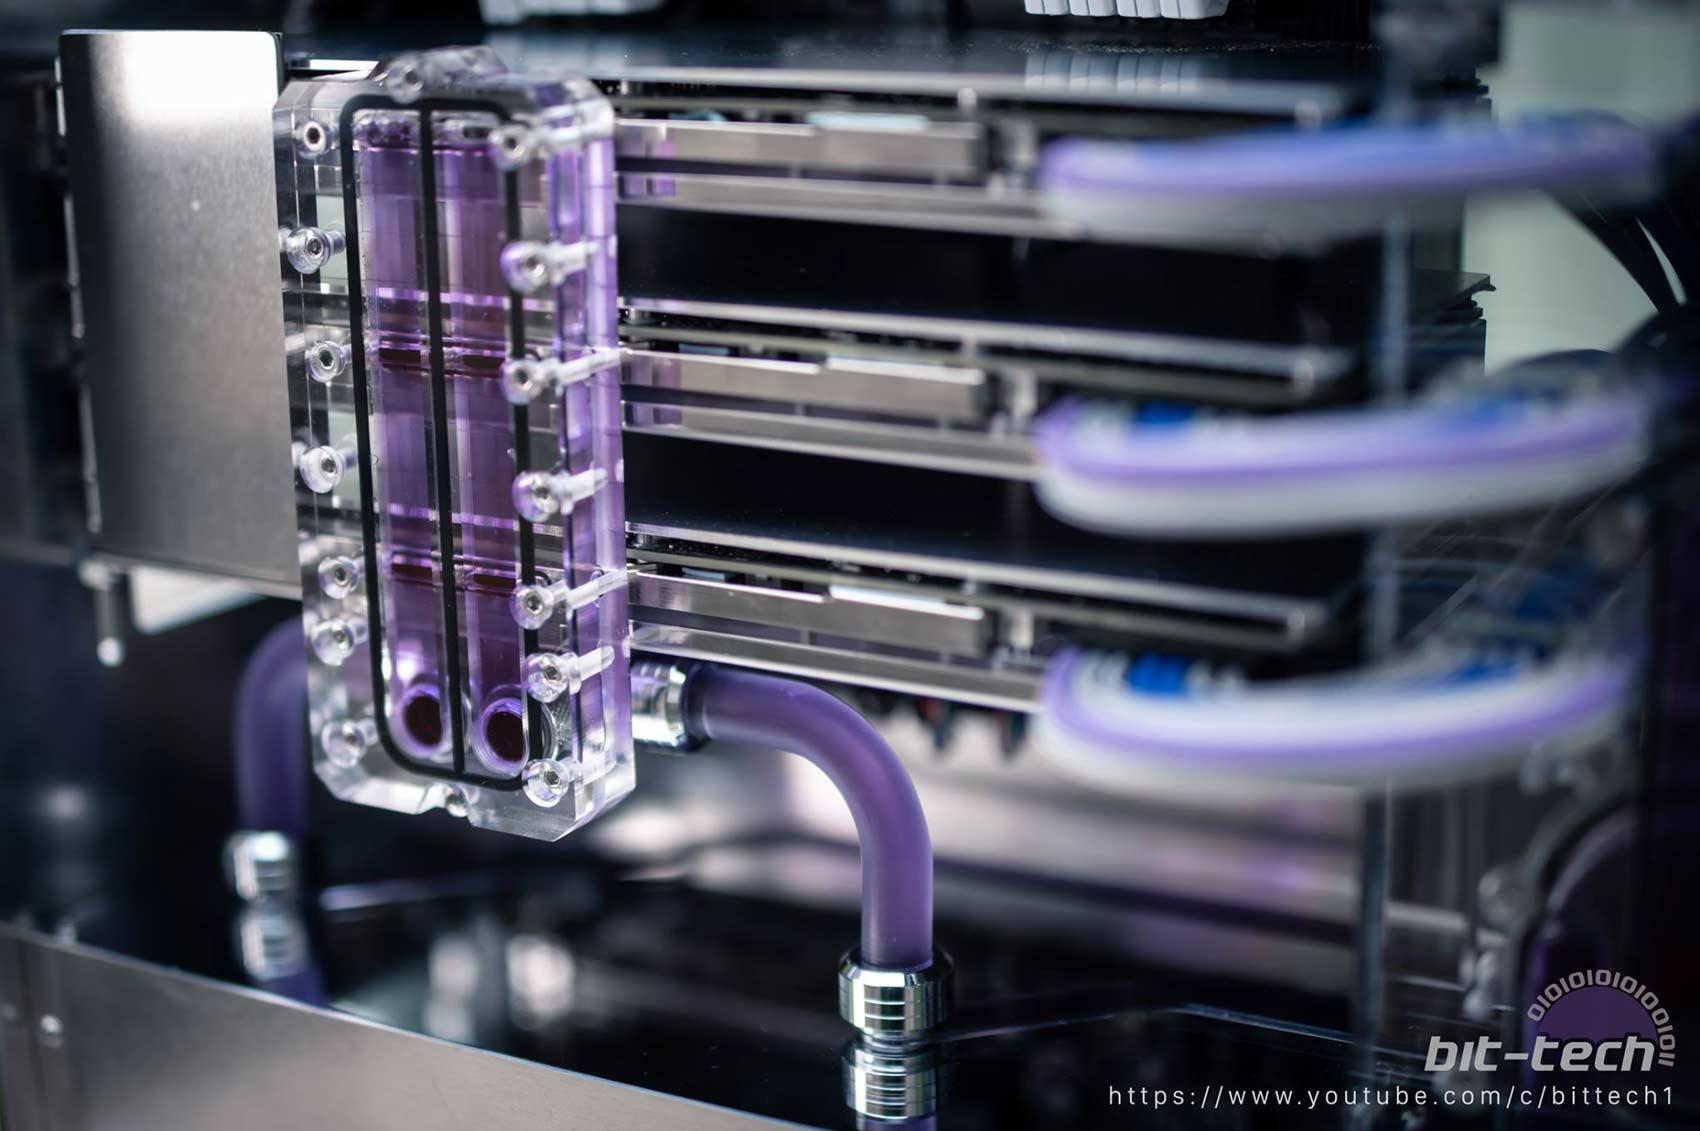 Mod The Bit-Tech 1000D Cometh